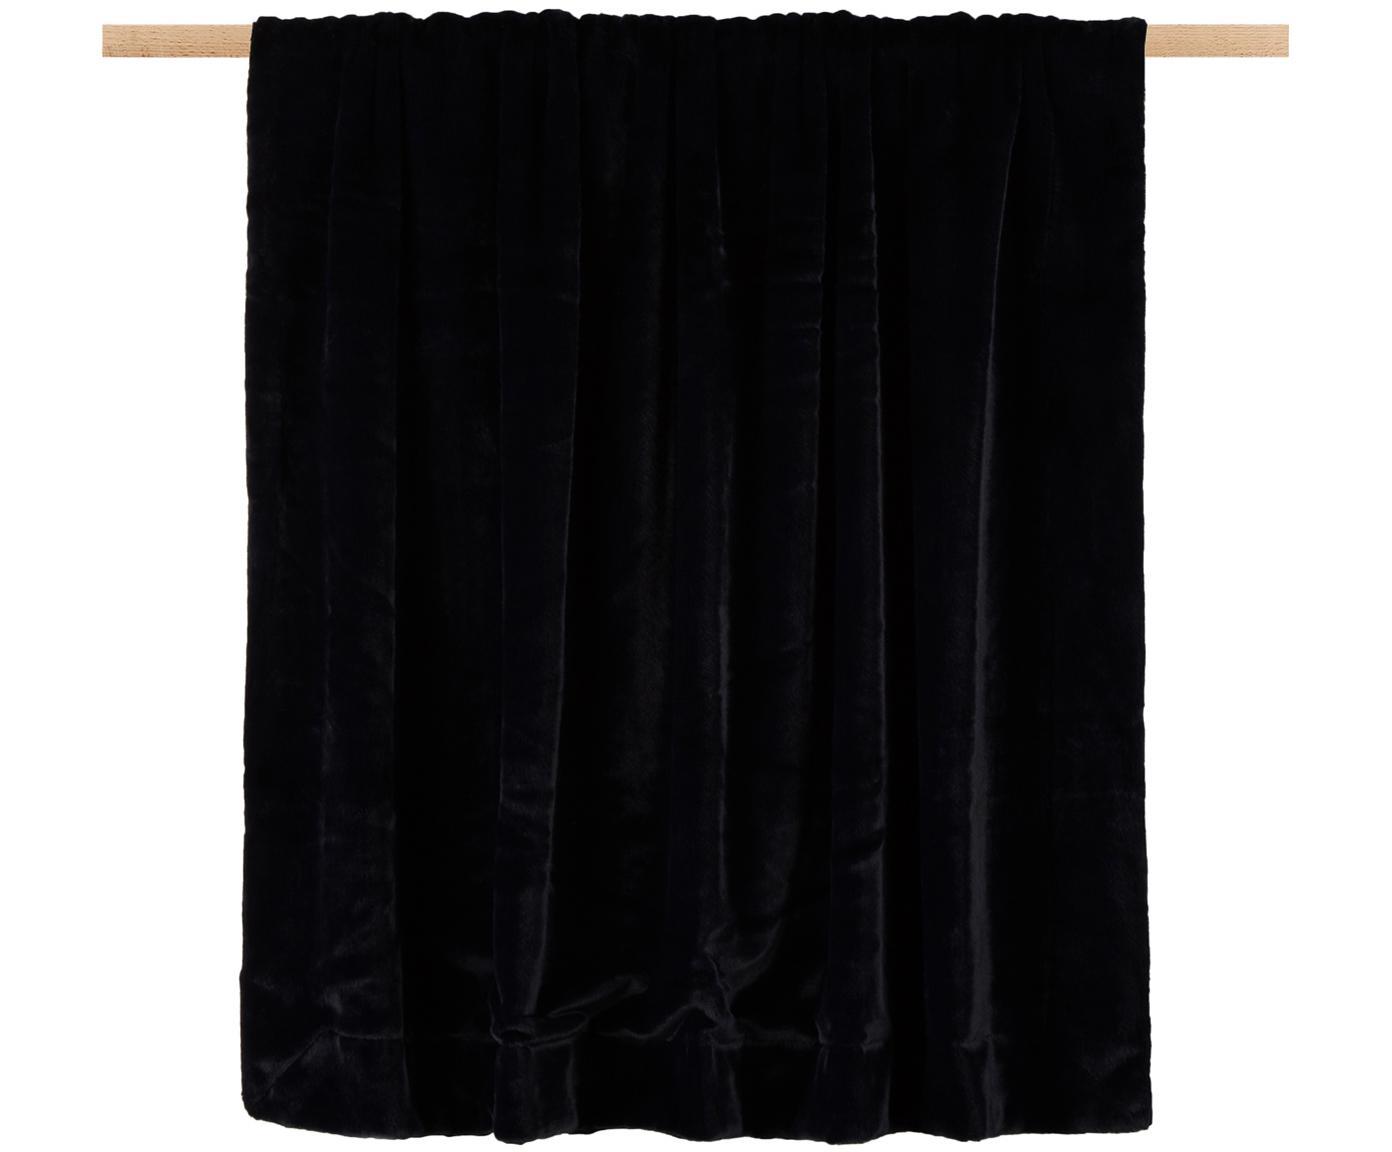 Kunstfell-Plaid Furry, Vorderseite: 60% Acetat, 40% Polyester, Rückseite: Polyester, Nachtblau, 150 x 200 cm